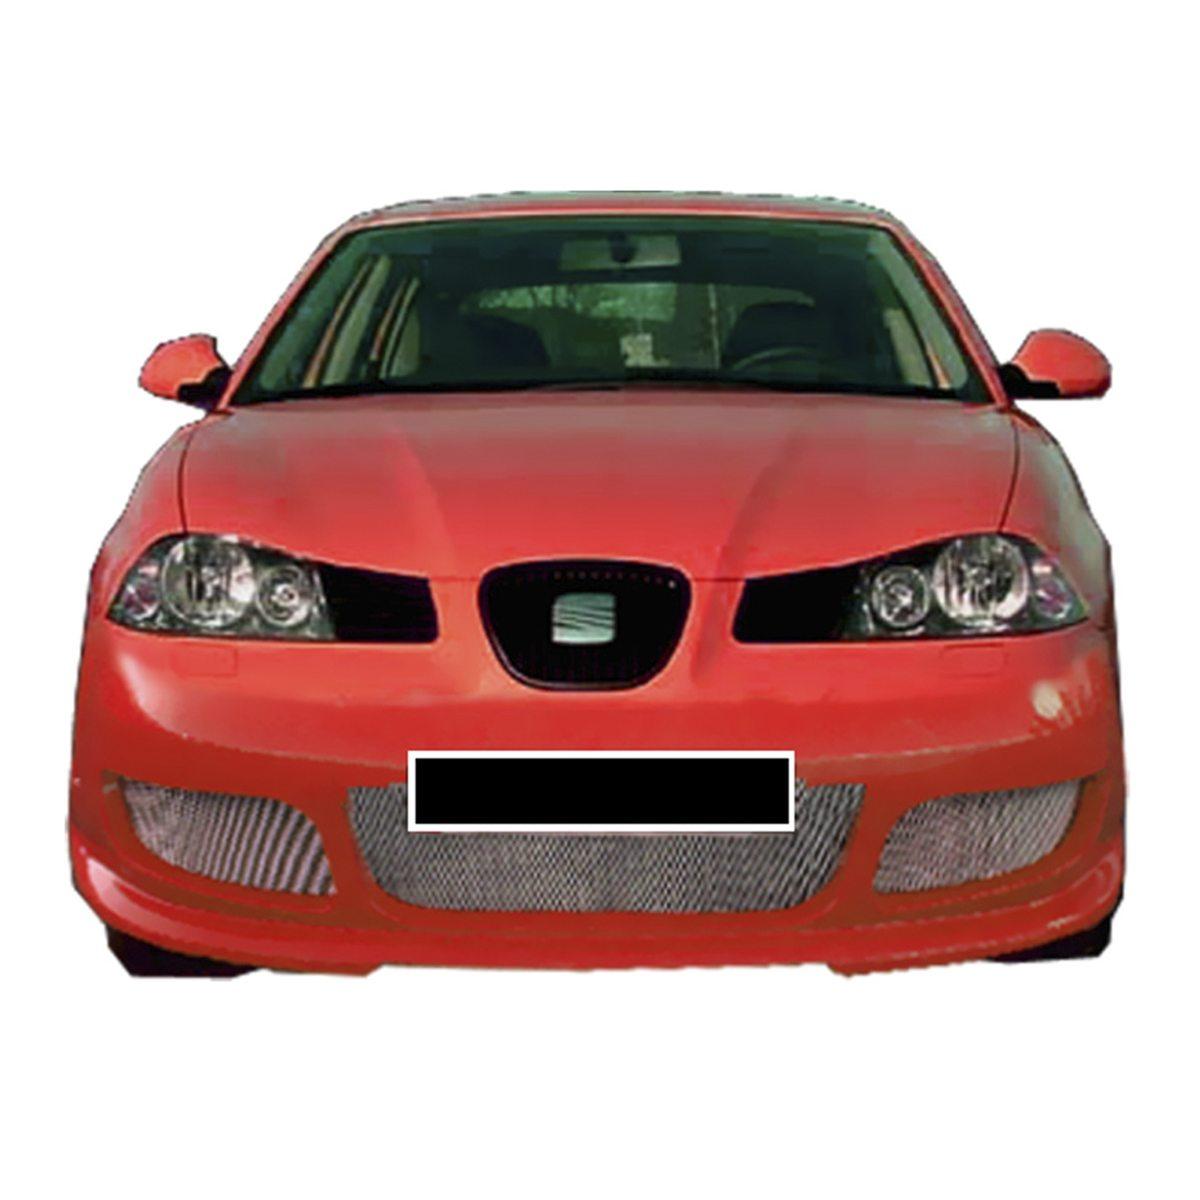 Seat-Ibiza-2003-Dragon-Frt-PCA126